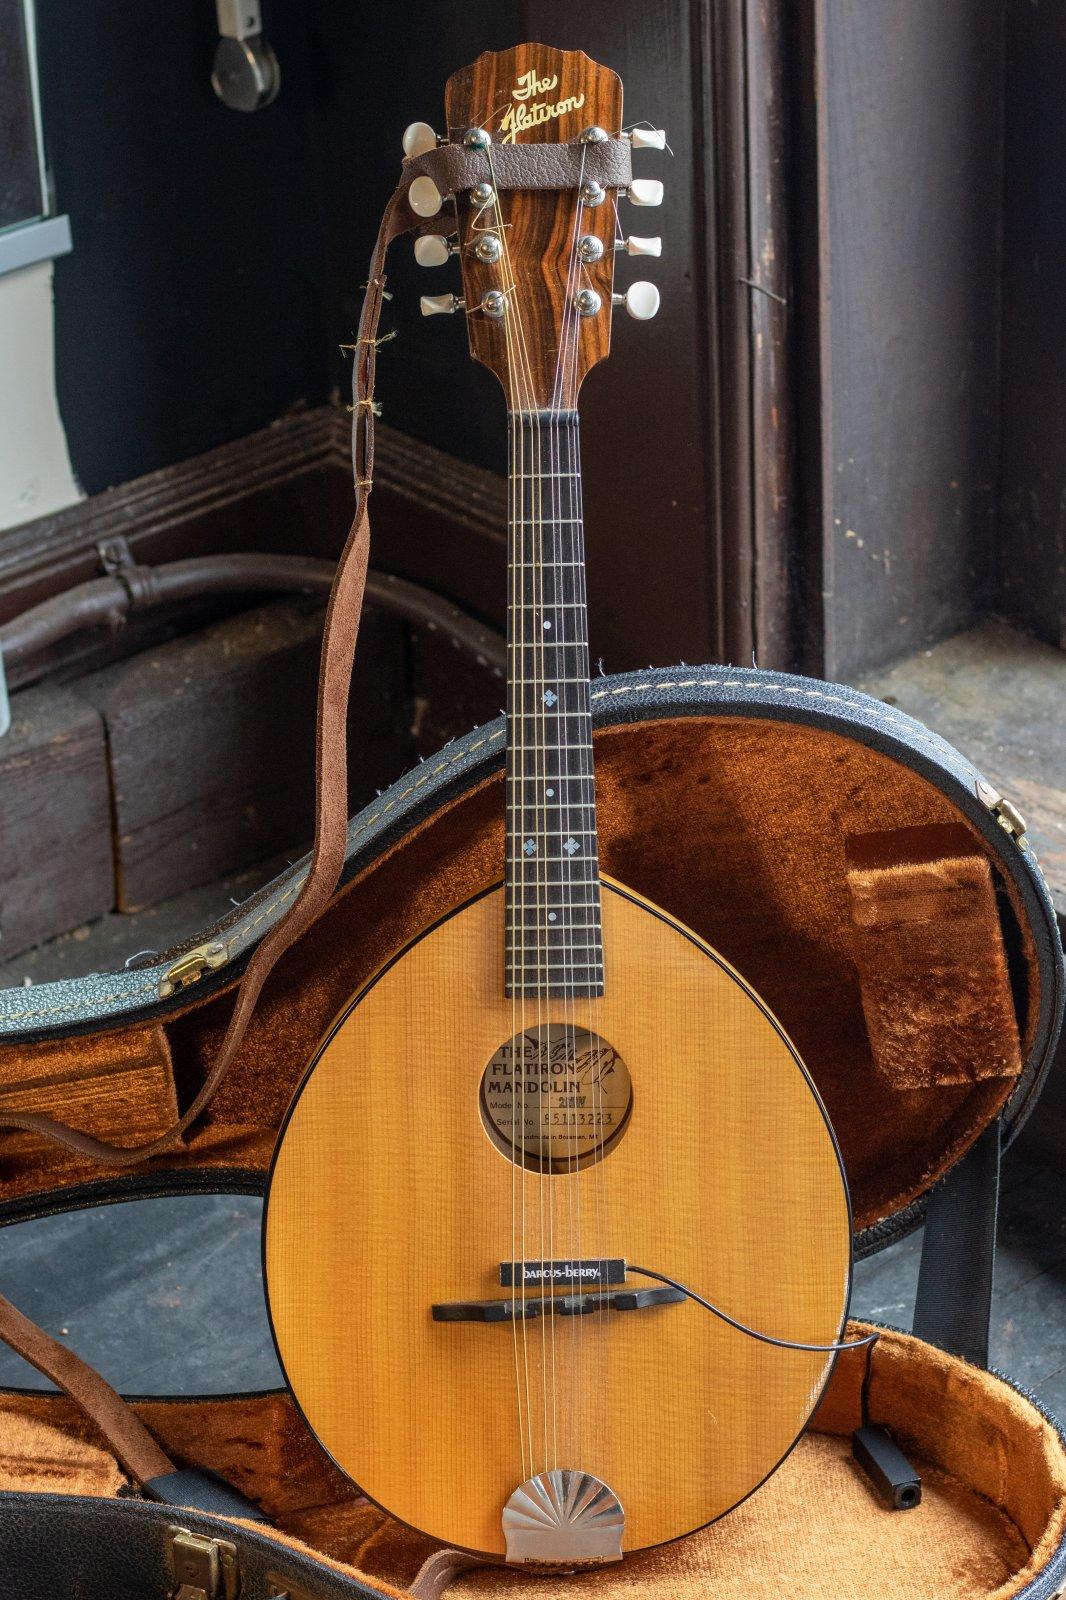 The Flatiron 2MW Mandolin